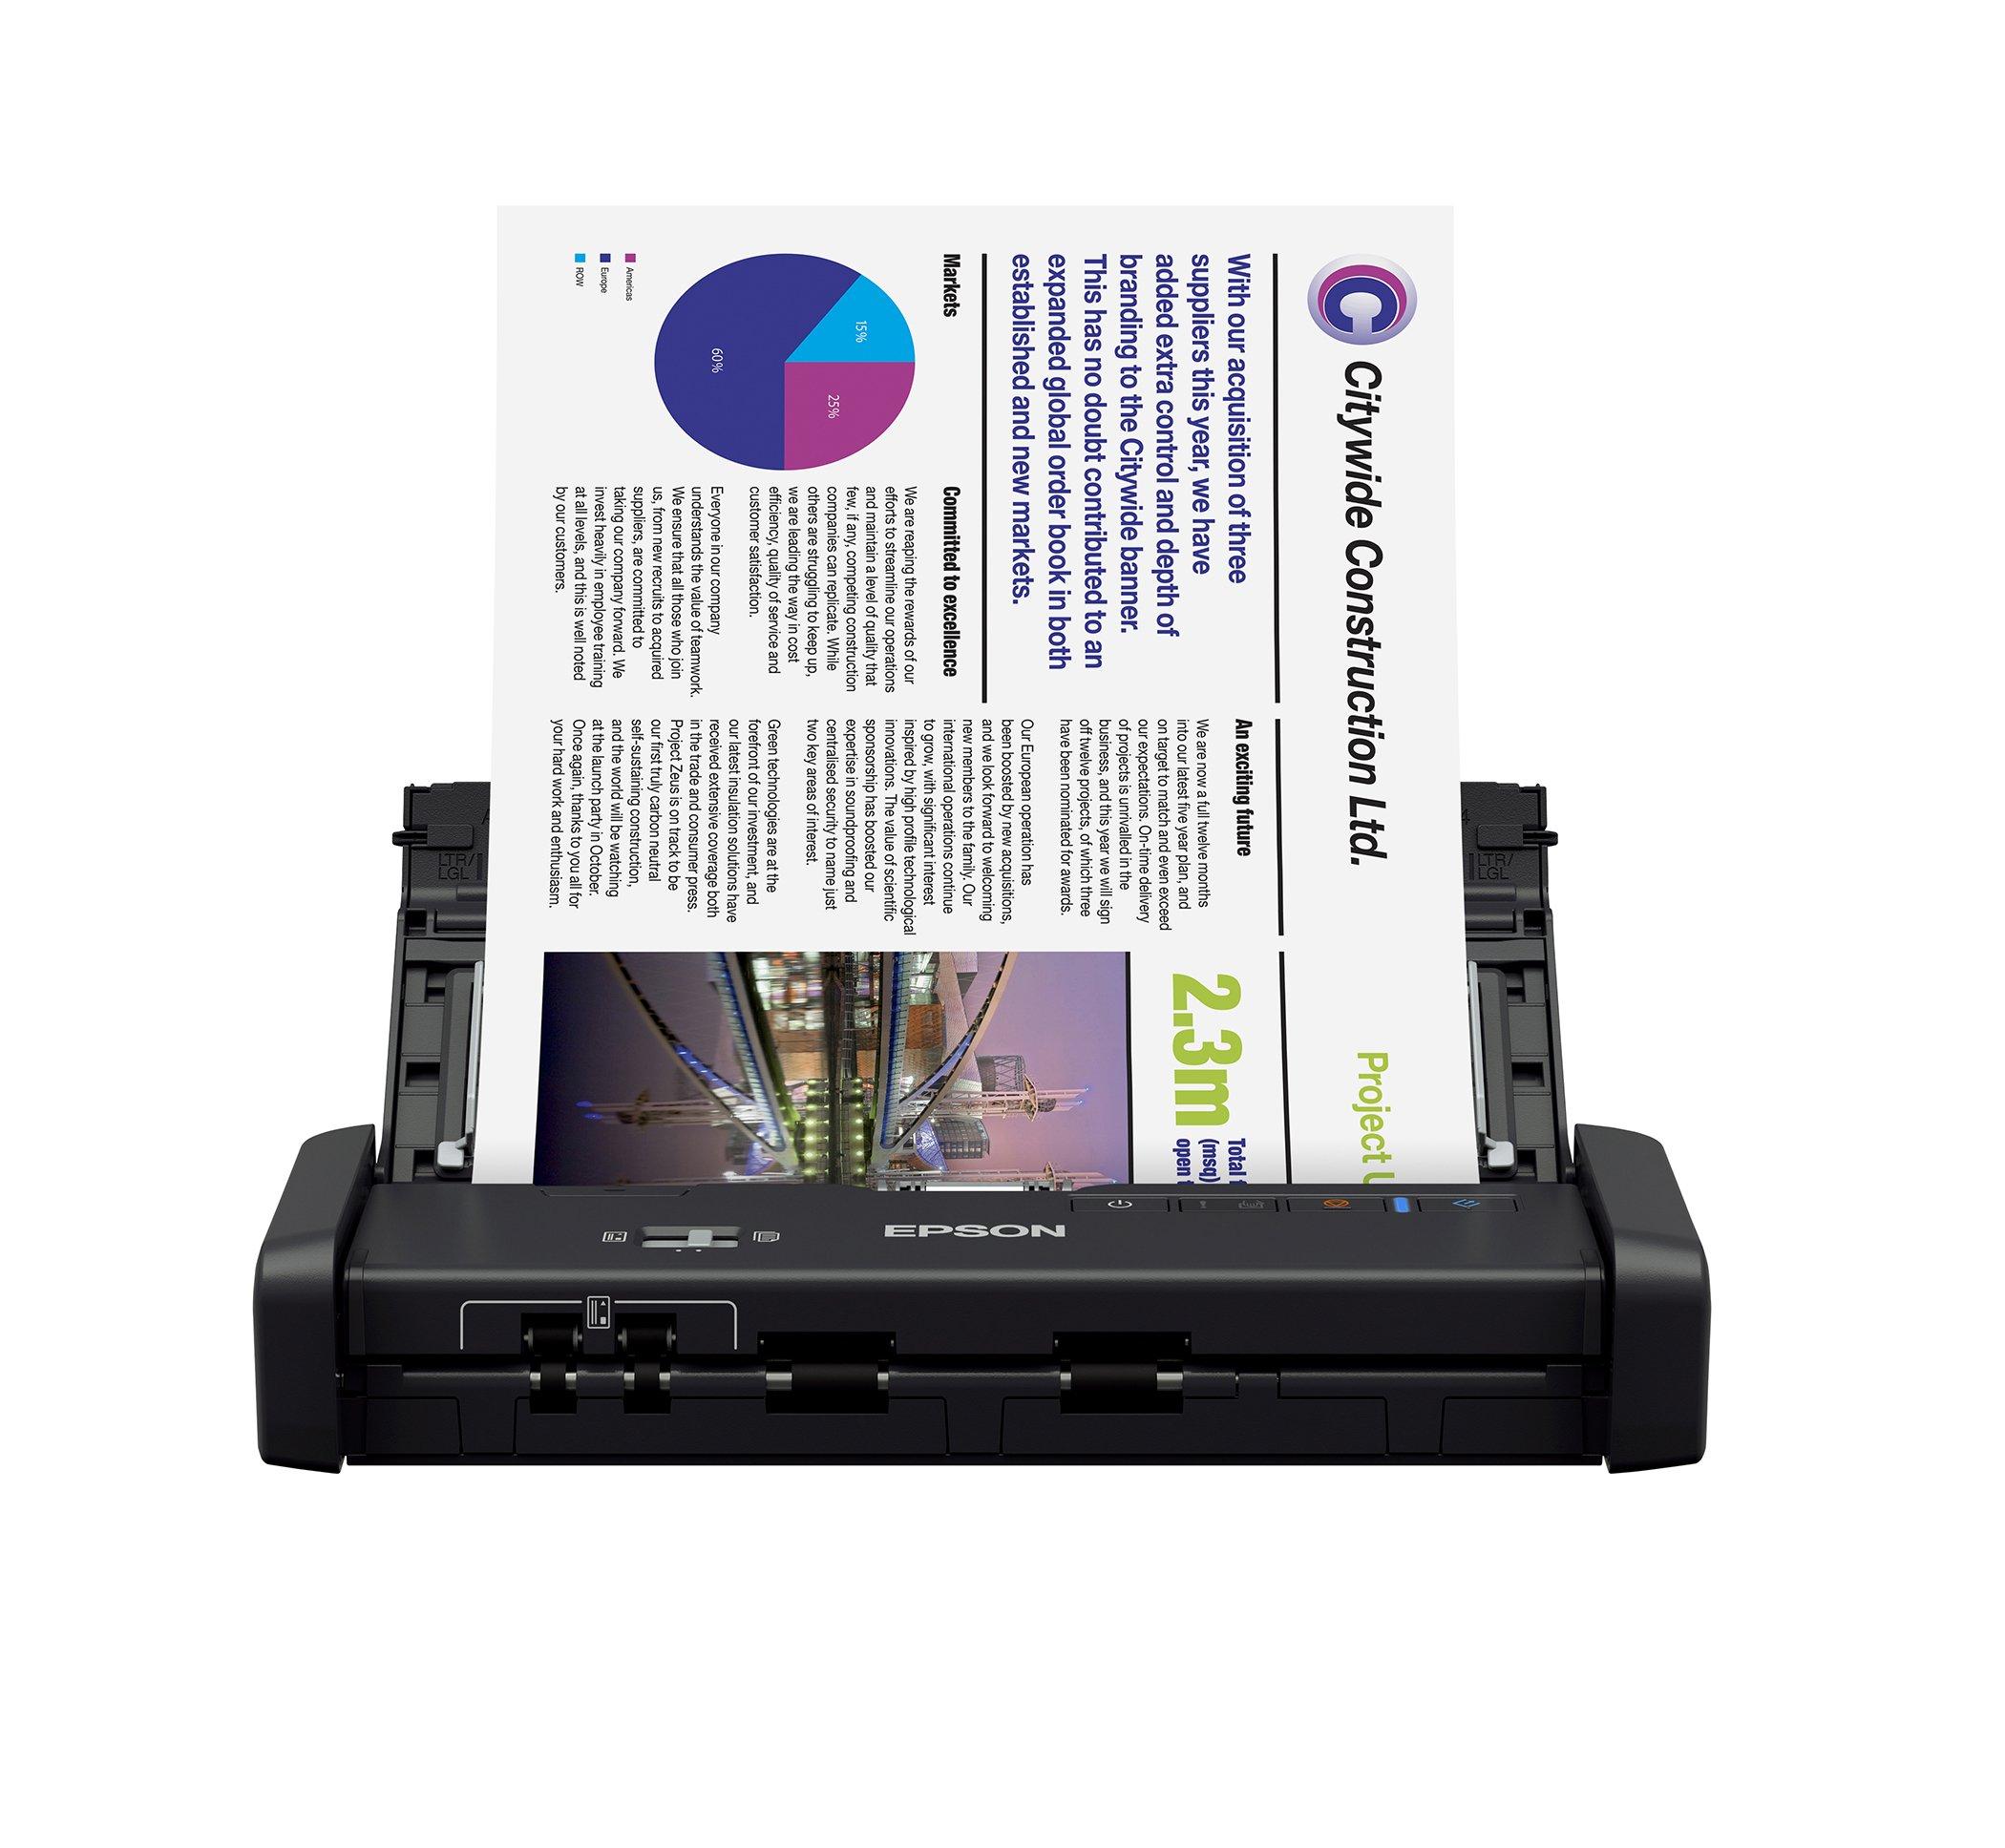 Epson Workforce ES 200 Portable Sheet fed